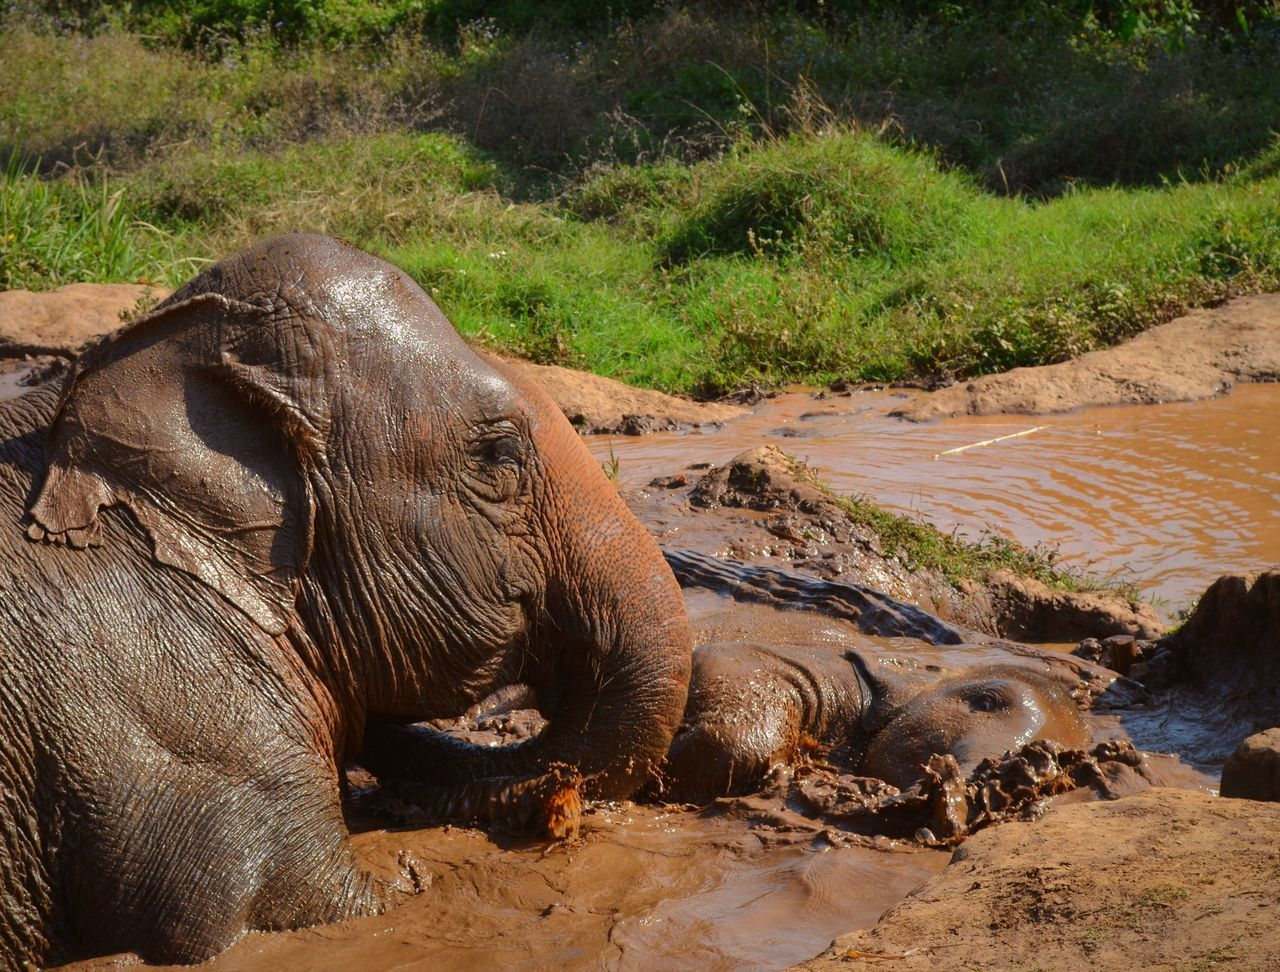 animals in the wild, animal themes, mammal, one animal, no people, animal wildlife, nature, day, safari animals, outdoors, hippopotamus, water, domestic animals, tree